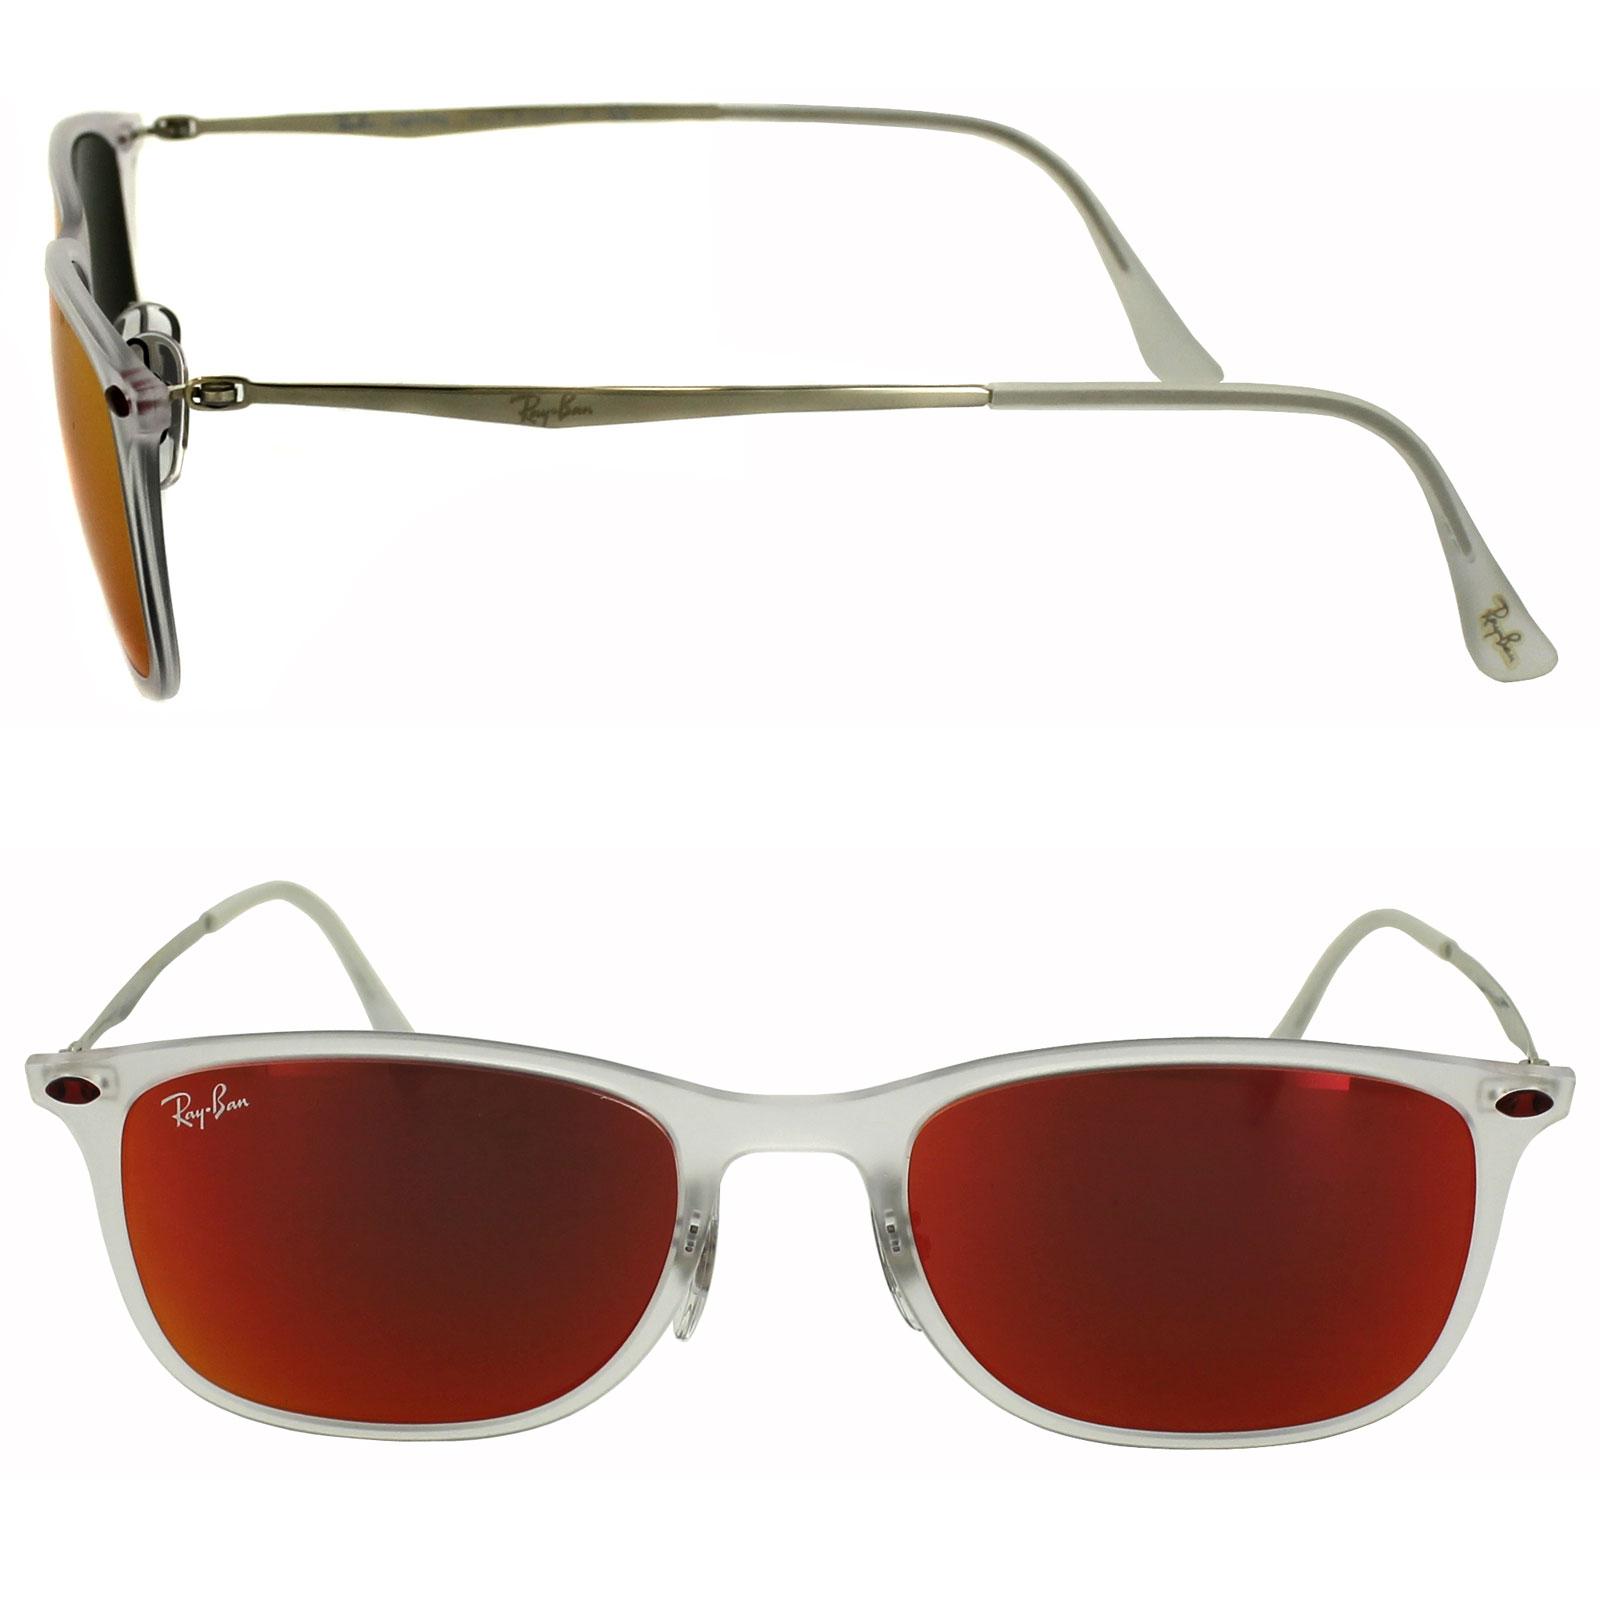 Ray-Ban Gafas de sol nuevas WAYFARER LIGHT RAY 4225 646 / 6q Rojo ...